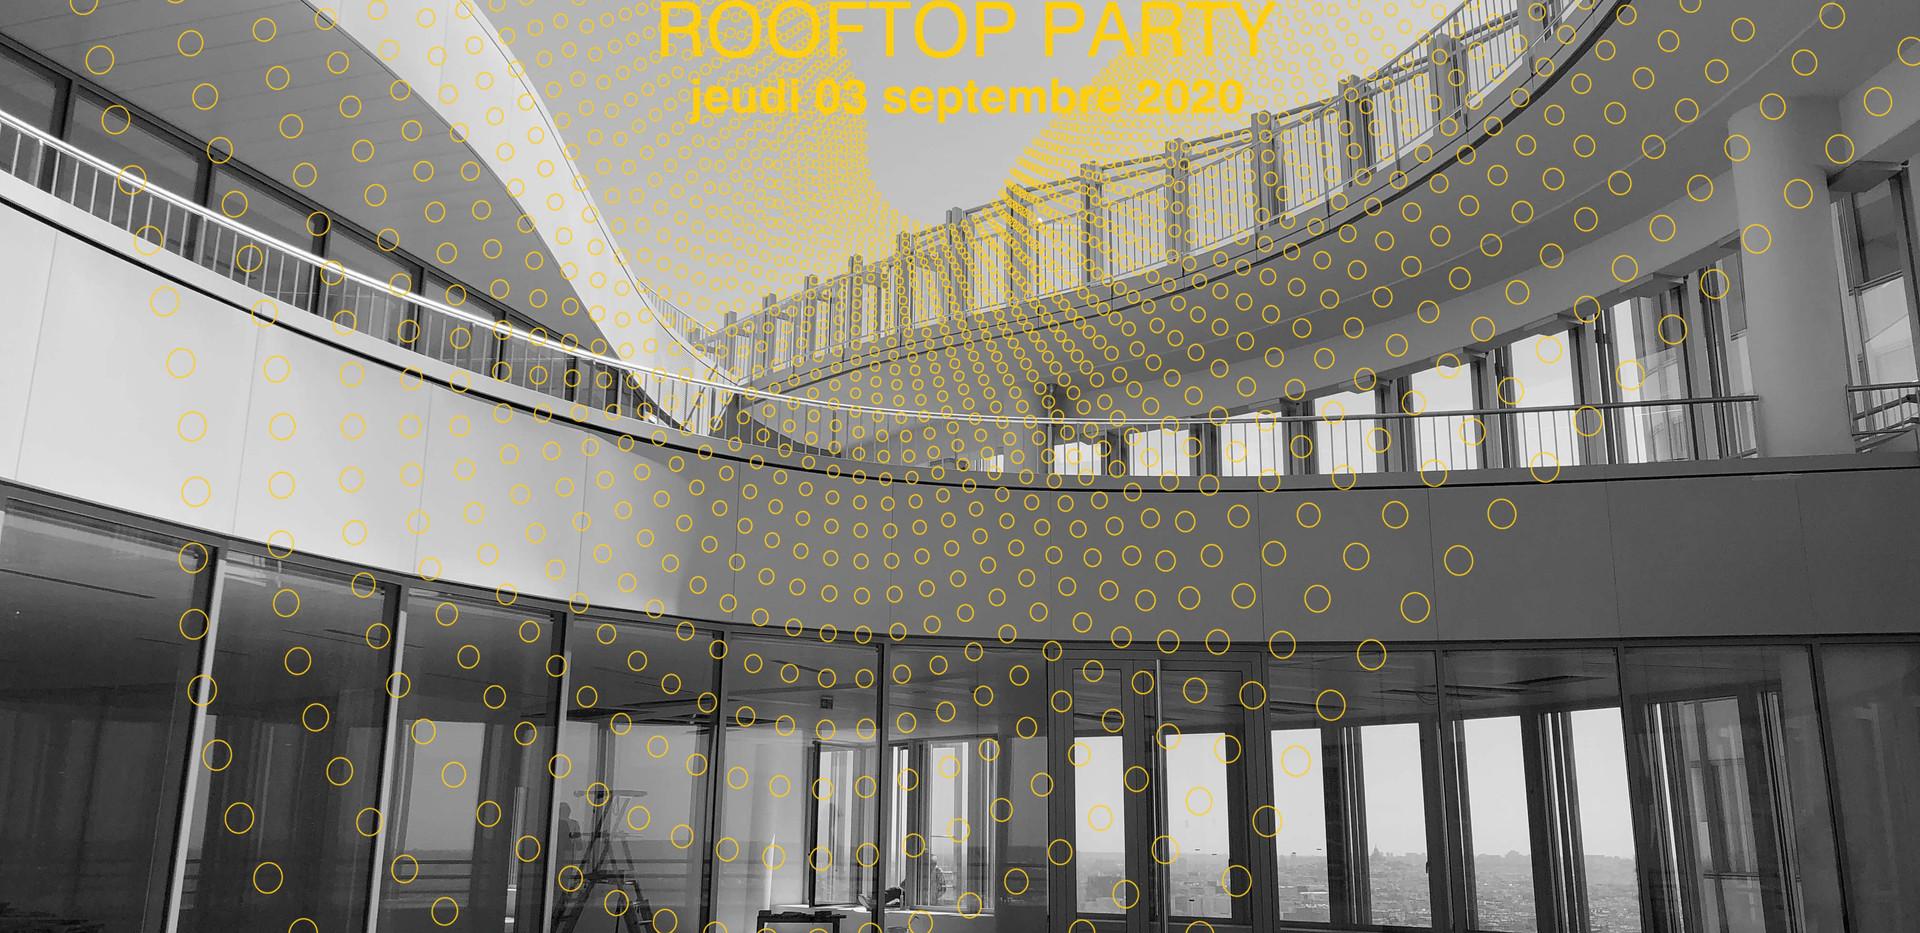 ALTO ROOFTOP PARTY